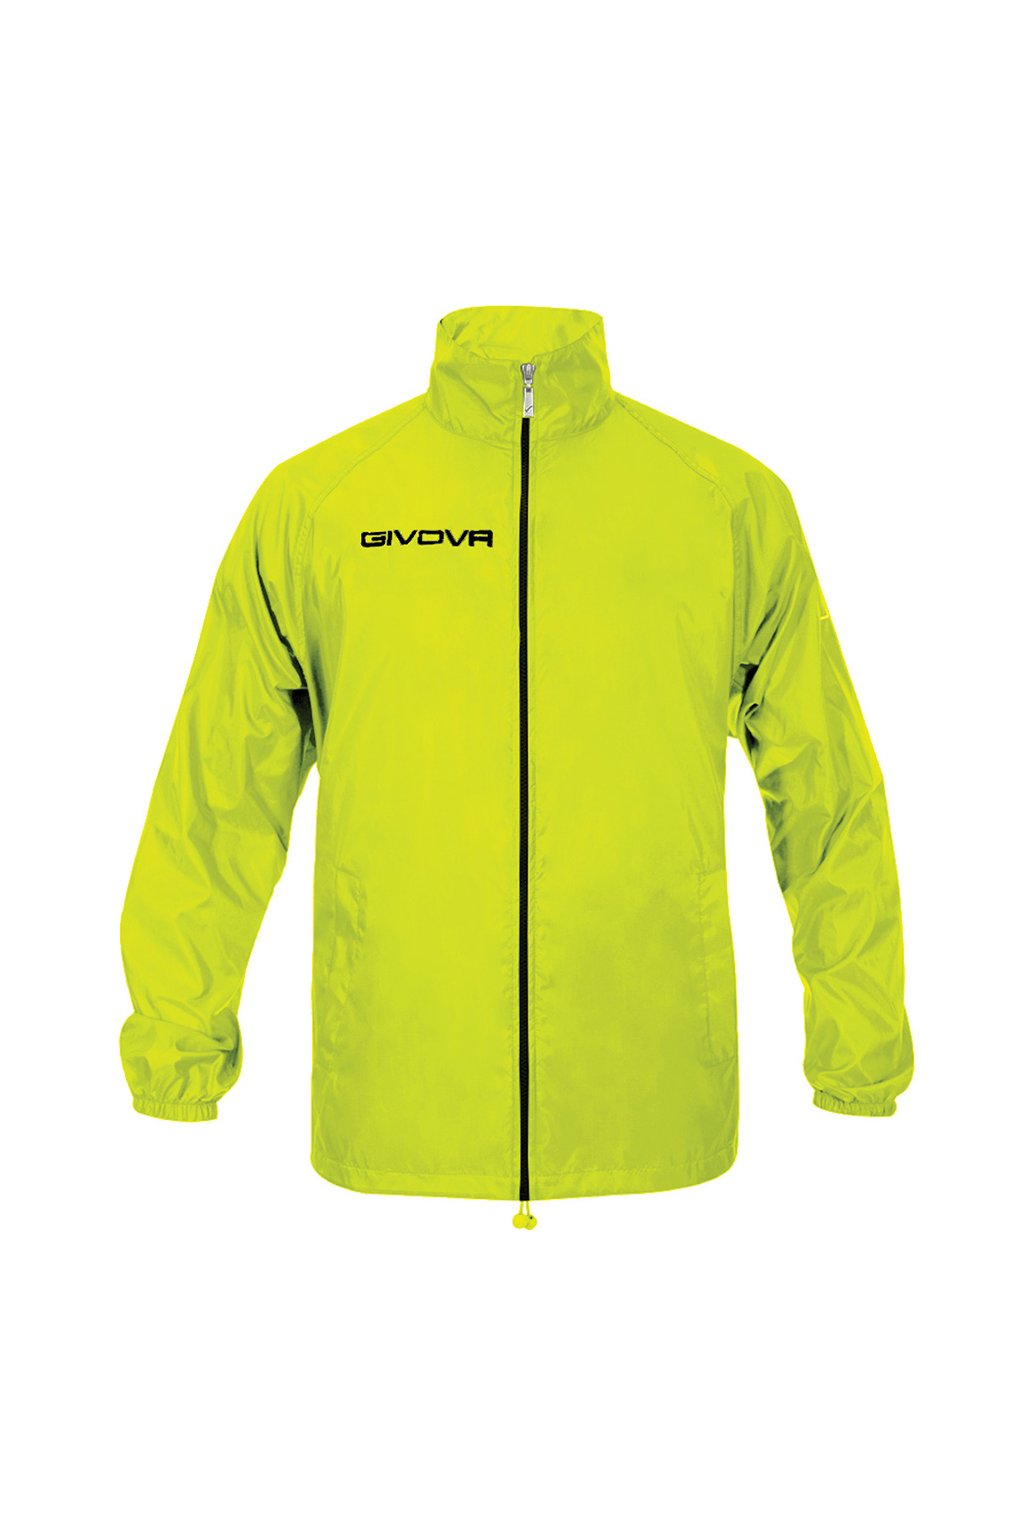 Bunda Givova Rain Basico Fluo žltá RJ001 0019